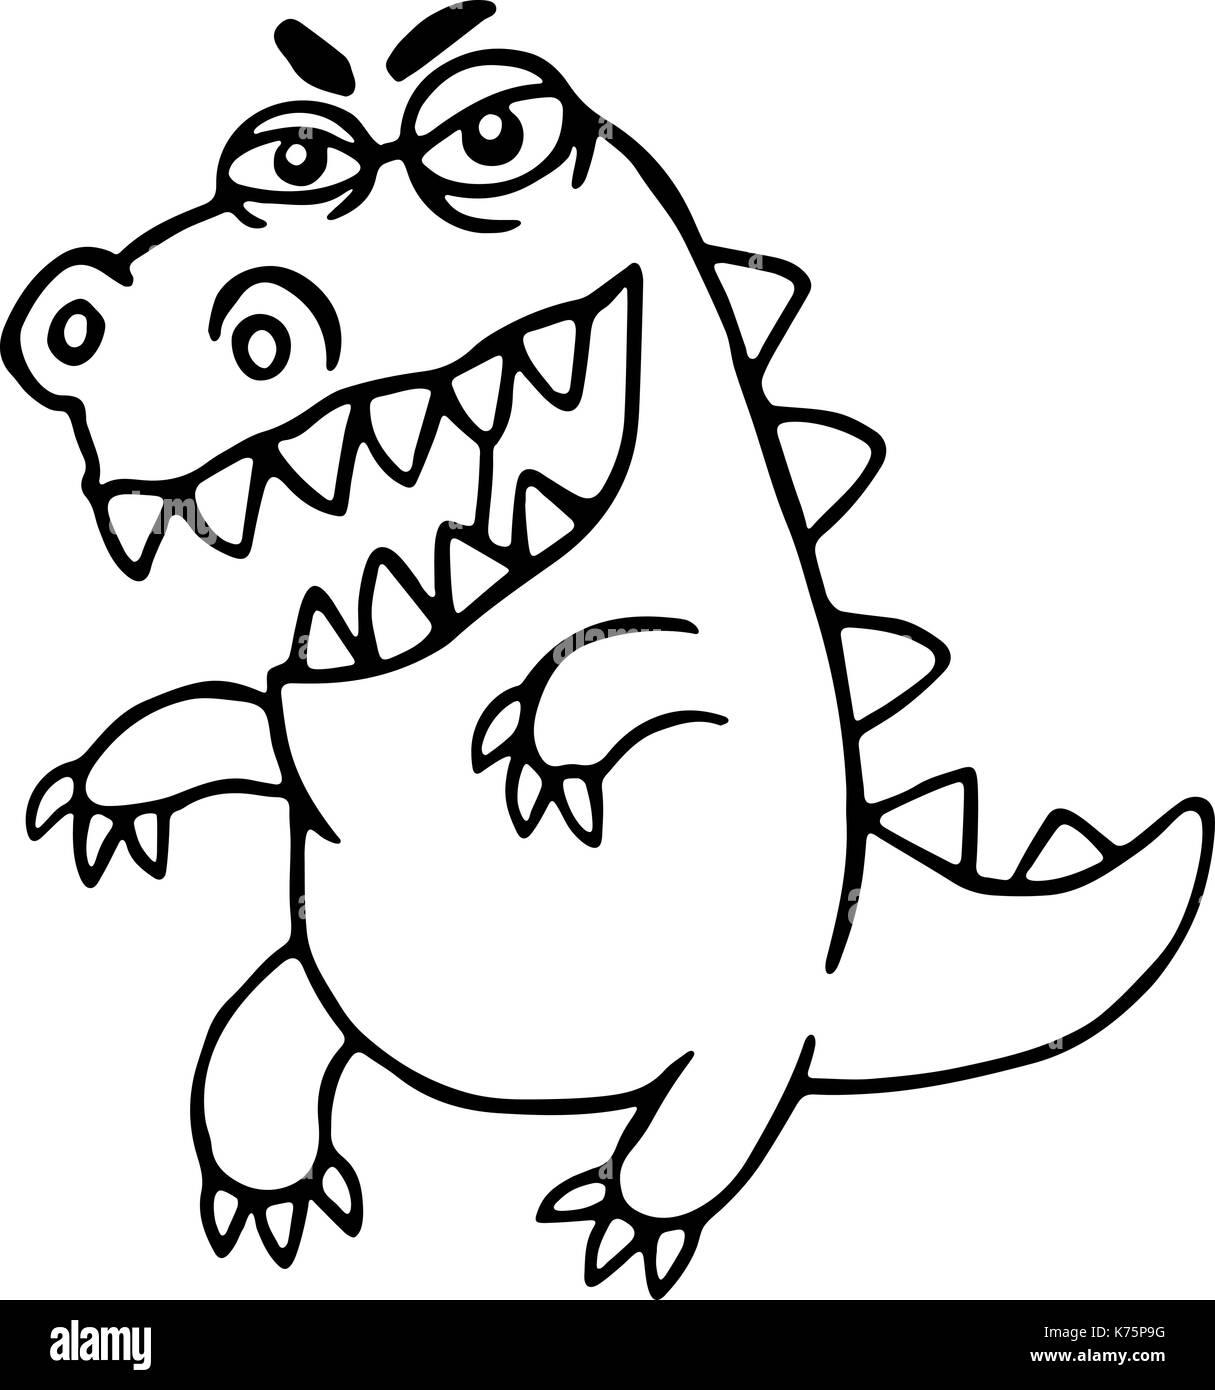 Angry cartoon dragon. Vector illustration. Cute imaginary animal character. - Stock Vector